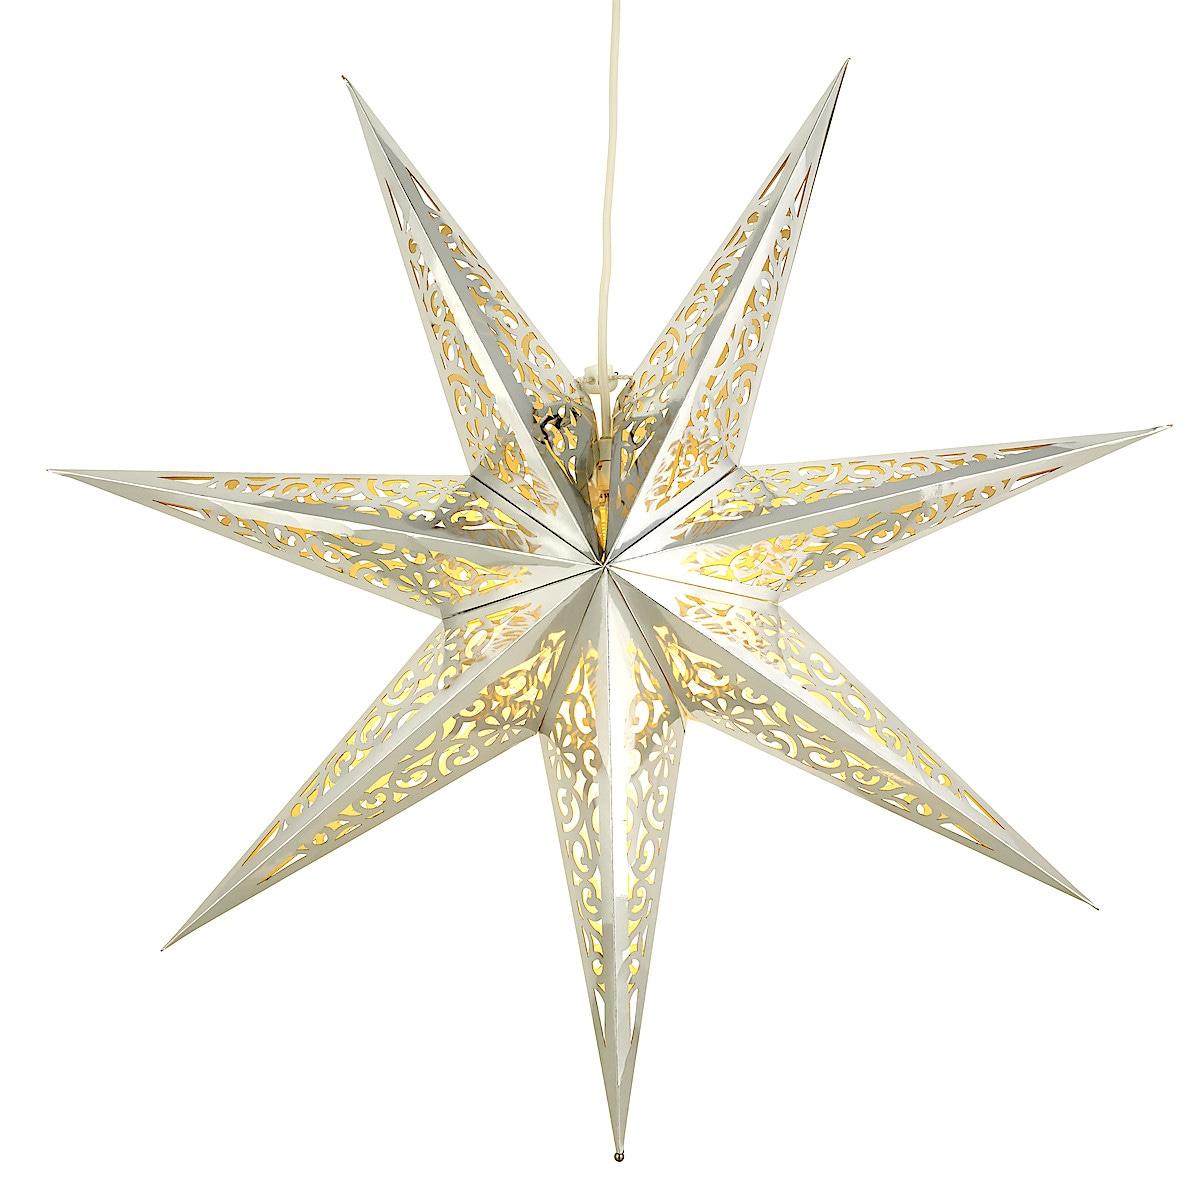 Northlight adventsstjerne 70 cm